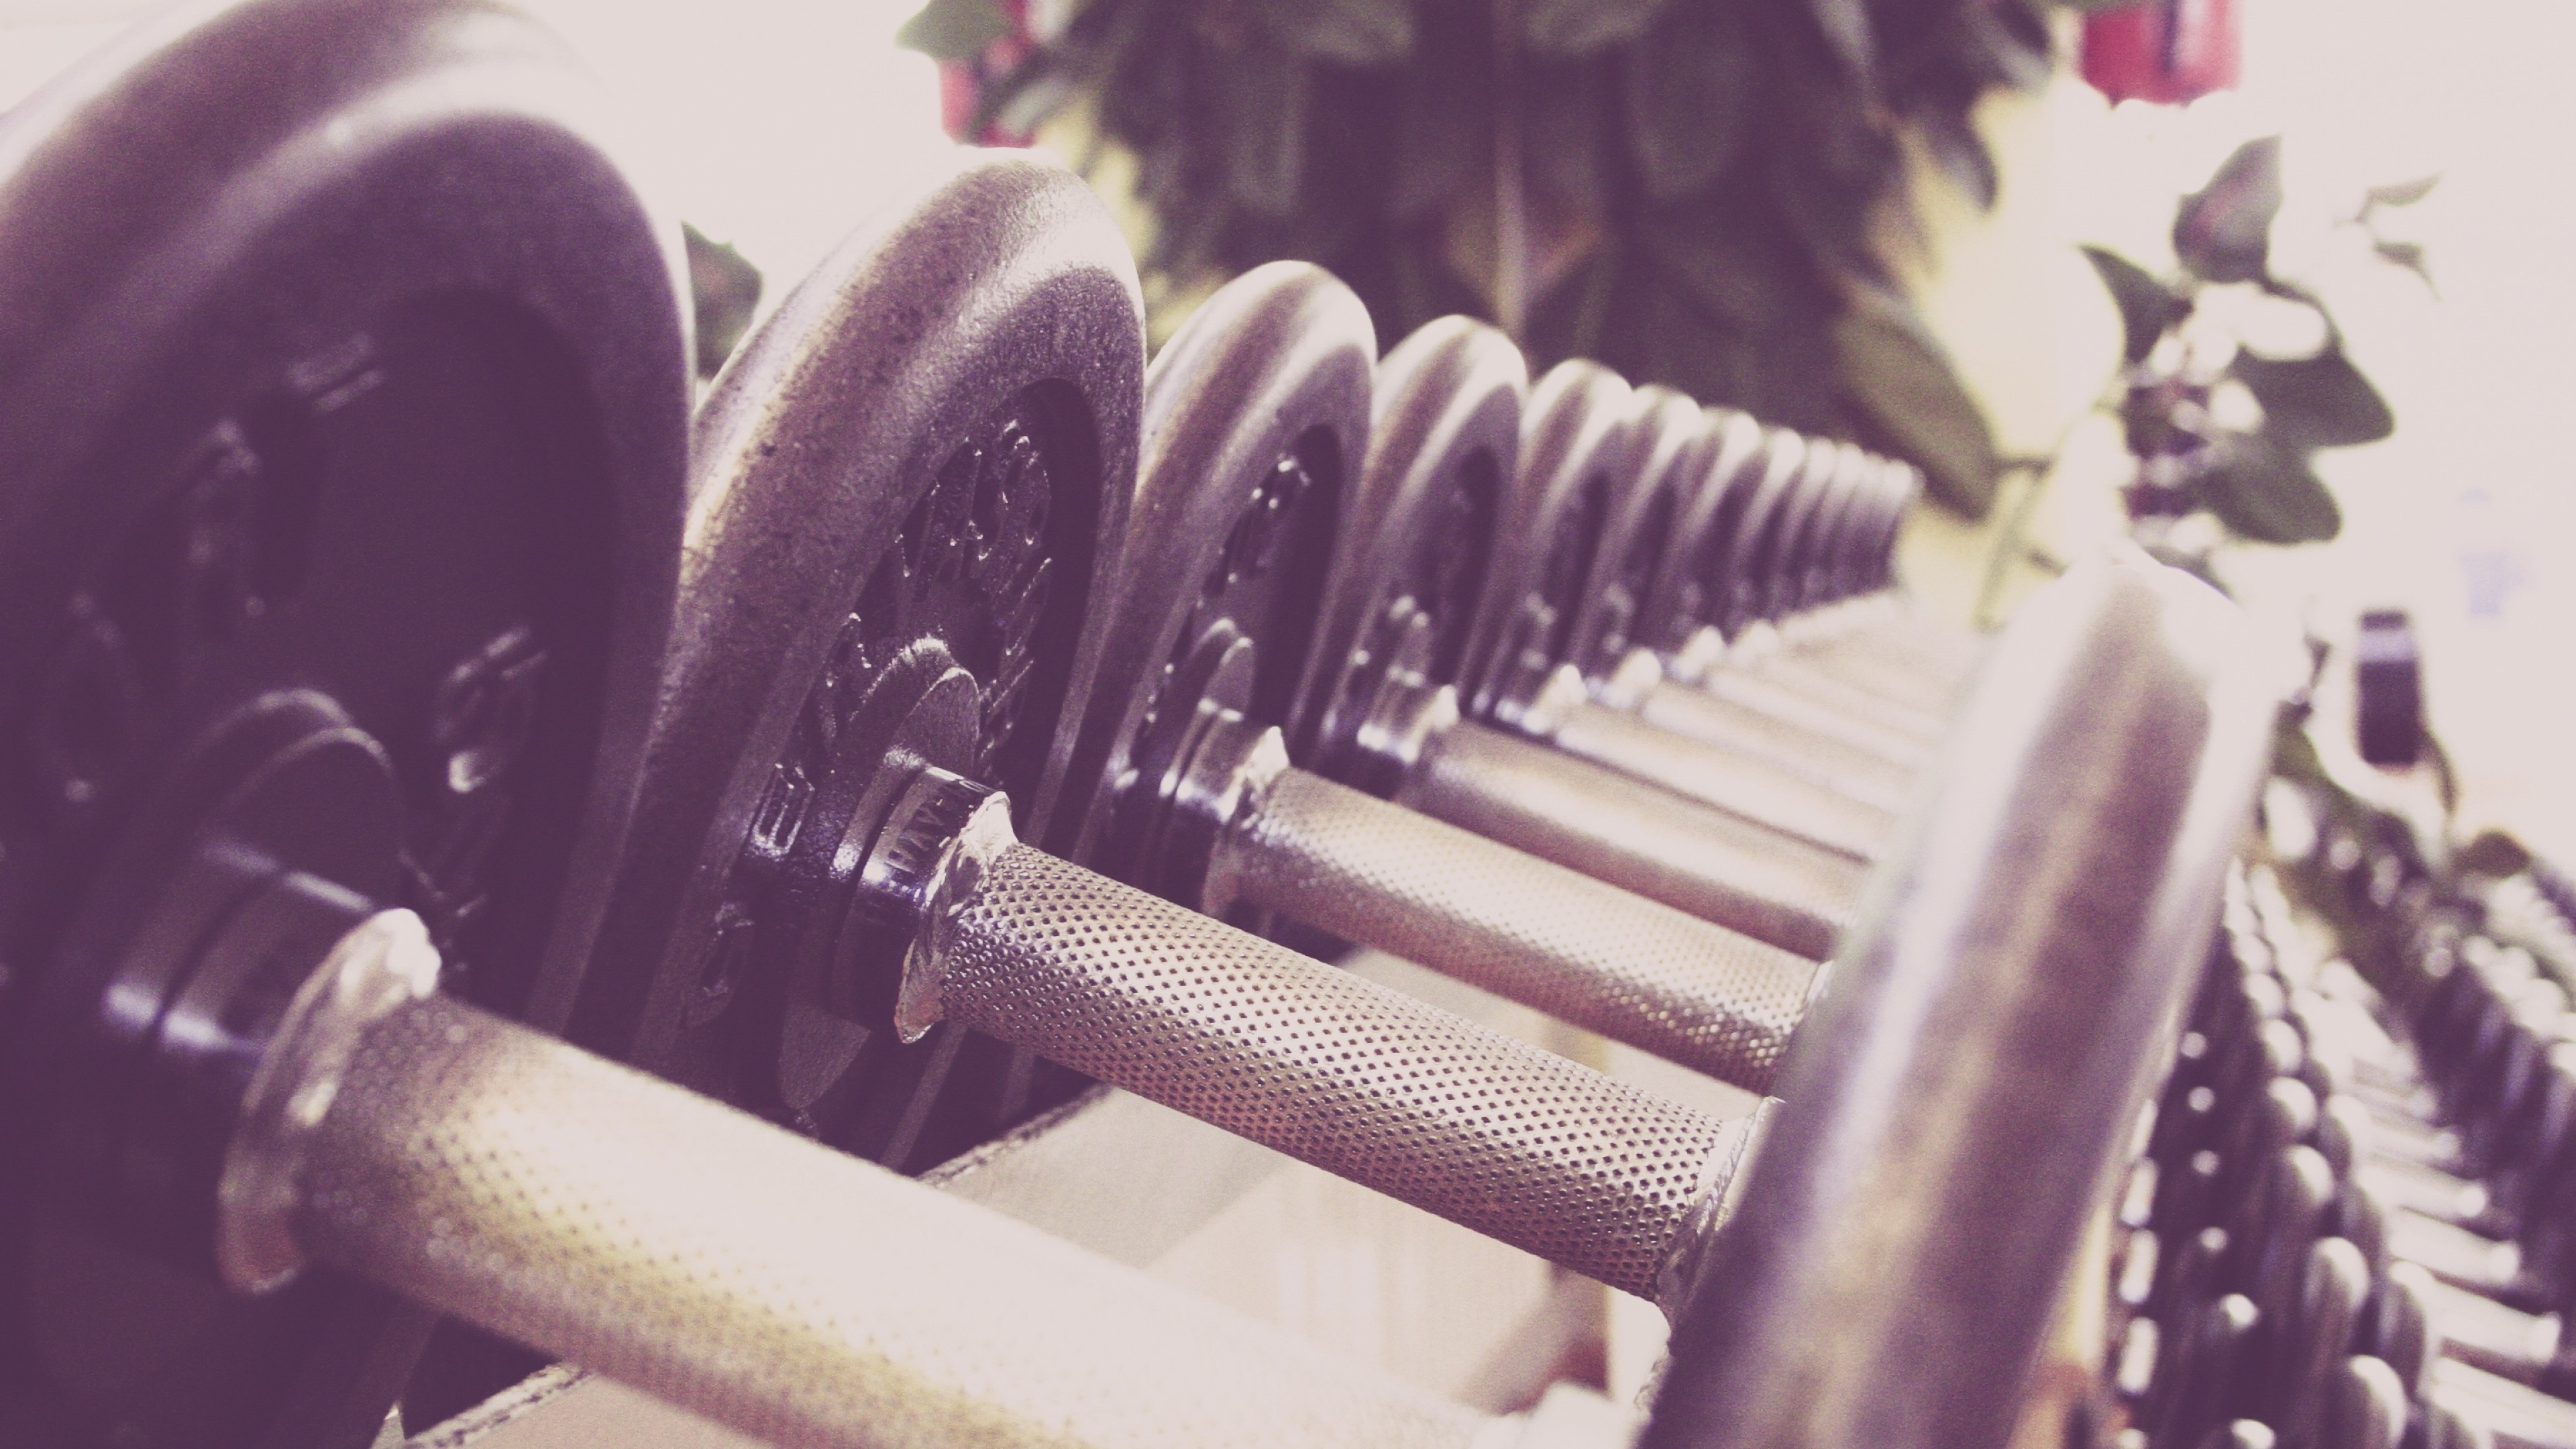 Wallpaper dumbbells, sports, gym